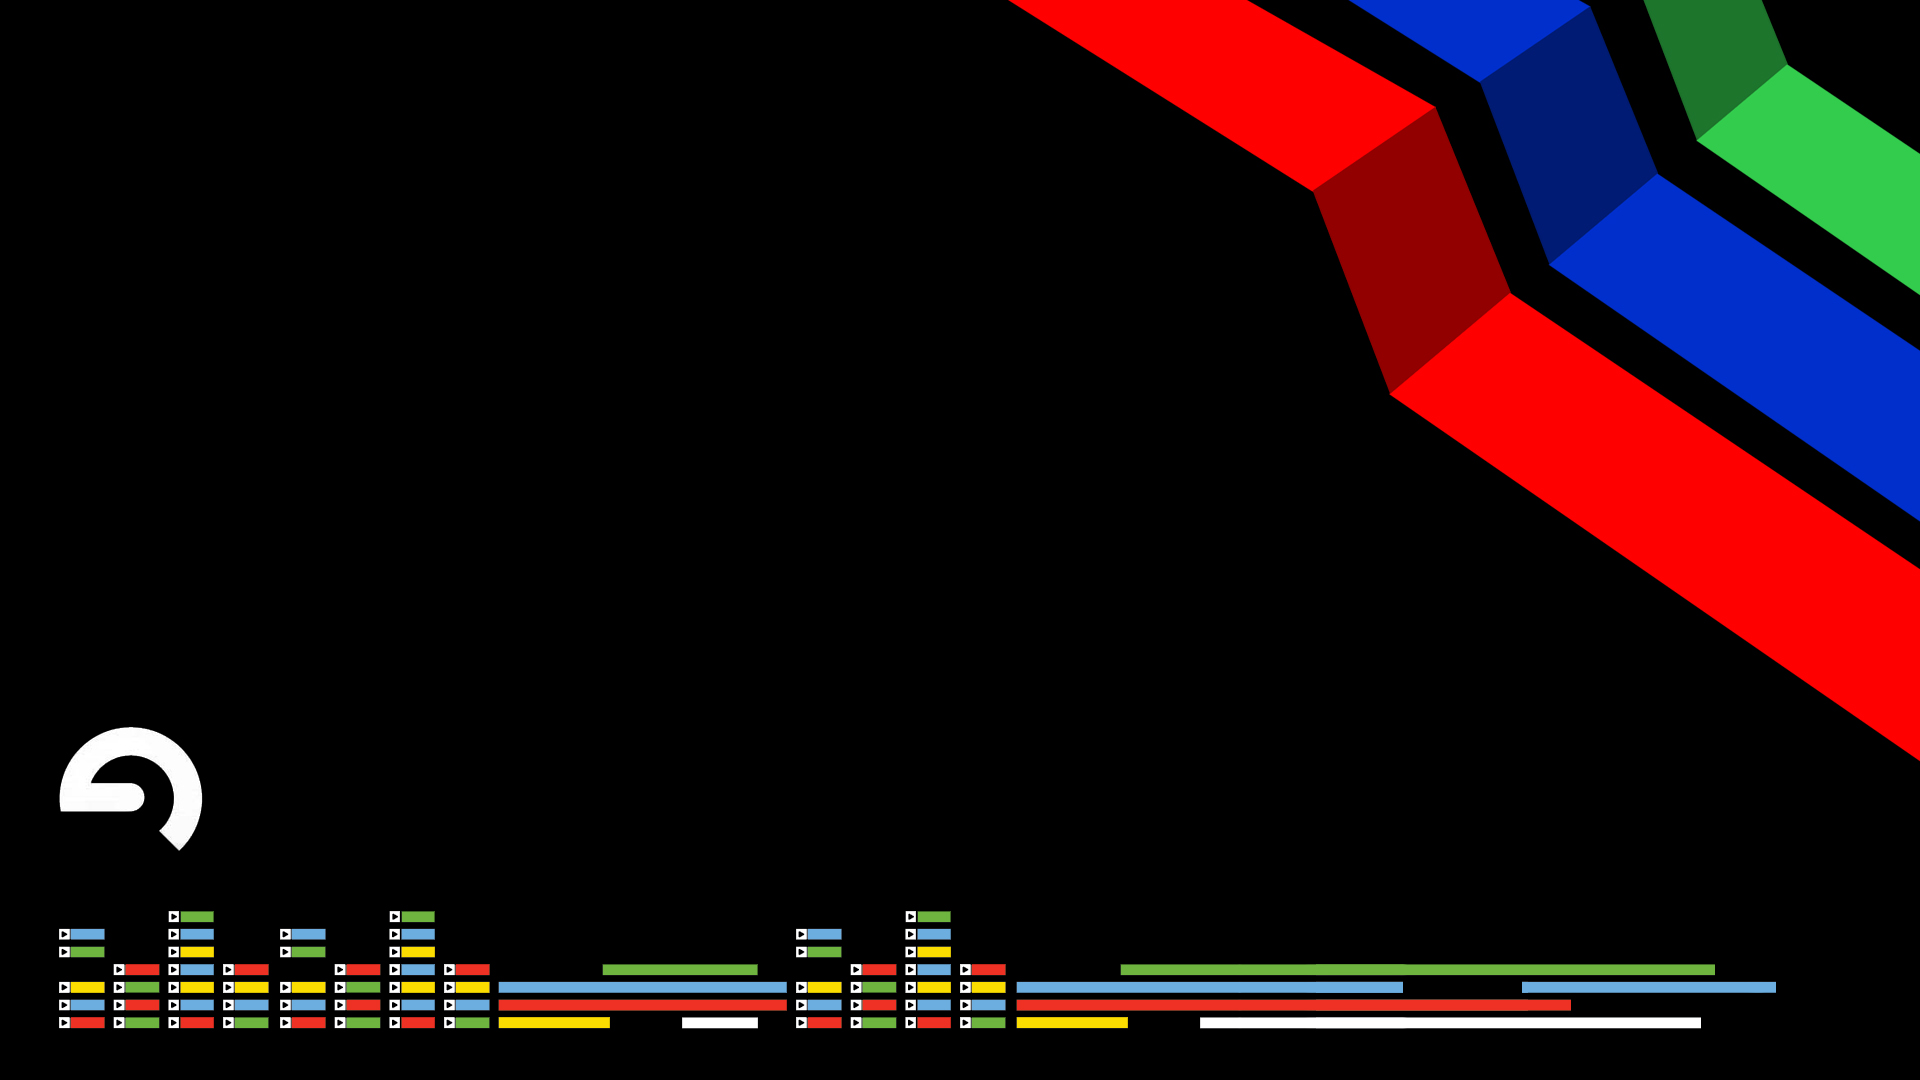 Ableton Play Image 16217 Wallpaper High Resolution 1920x1080